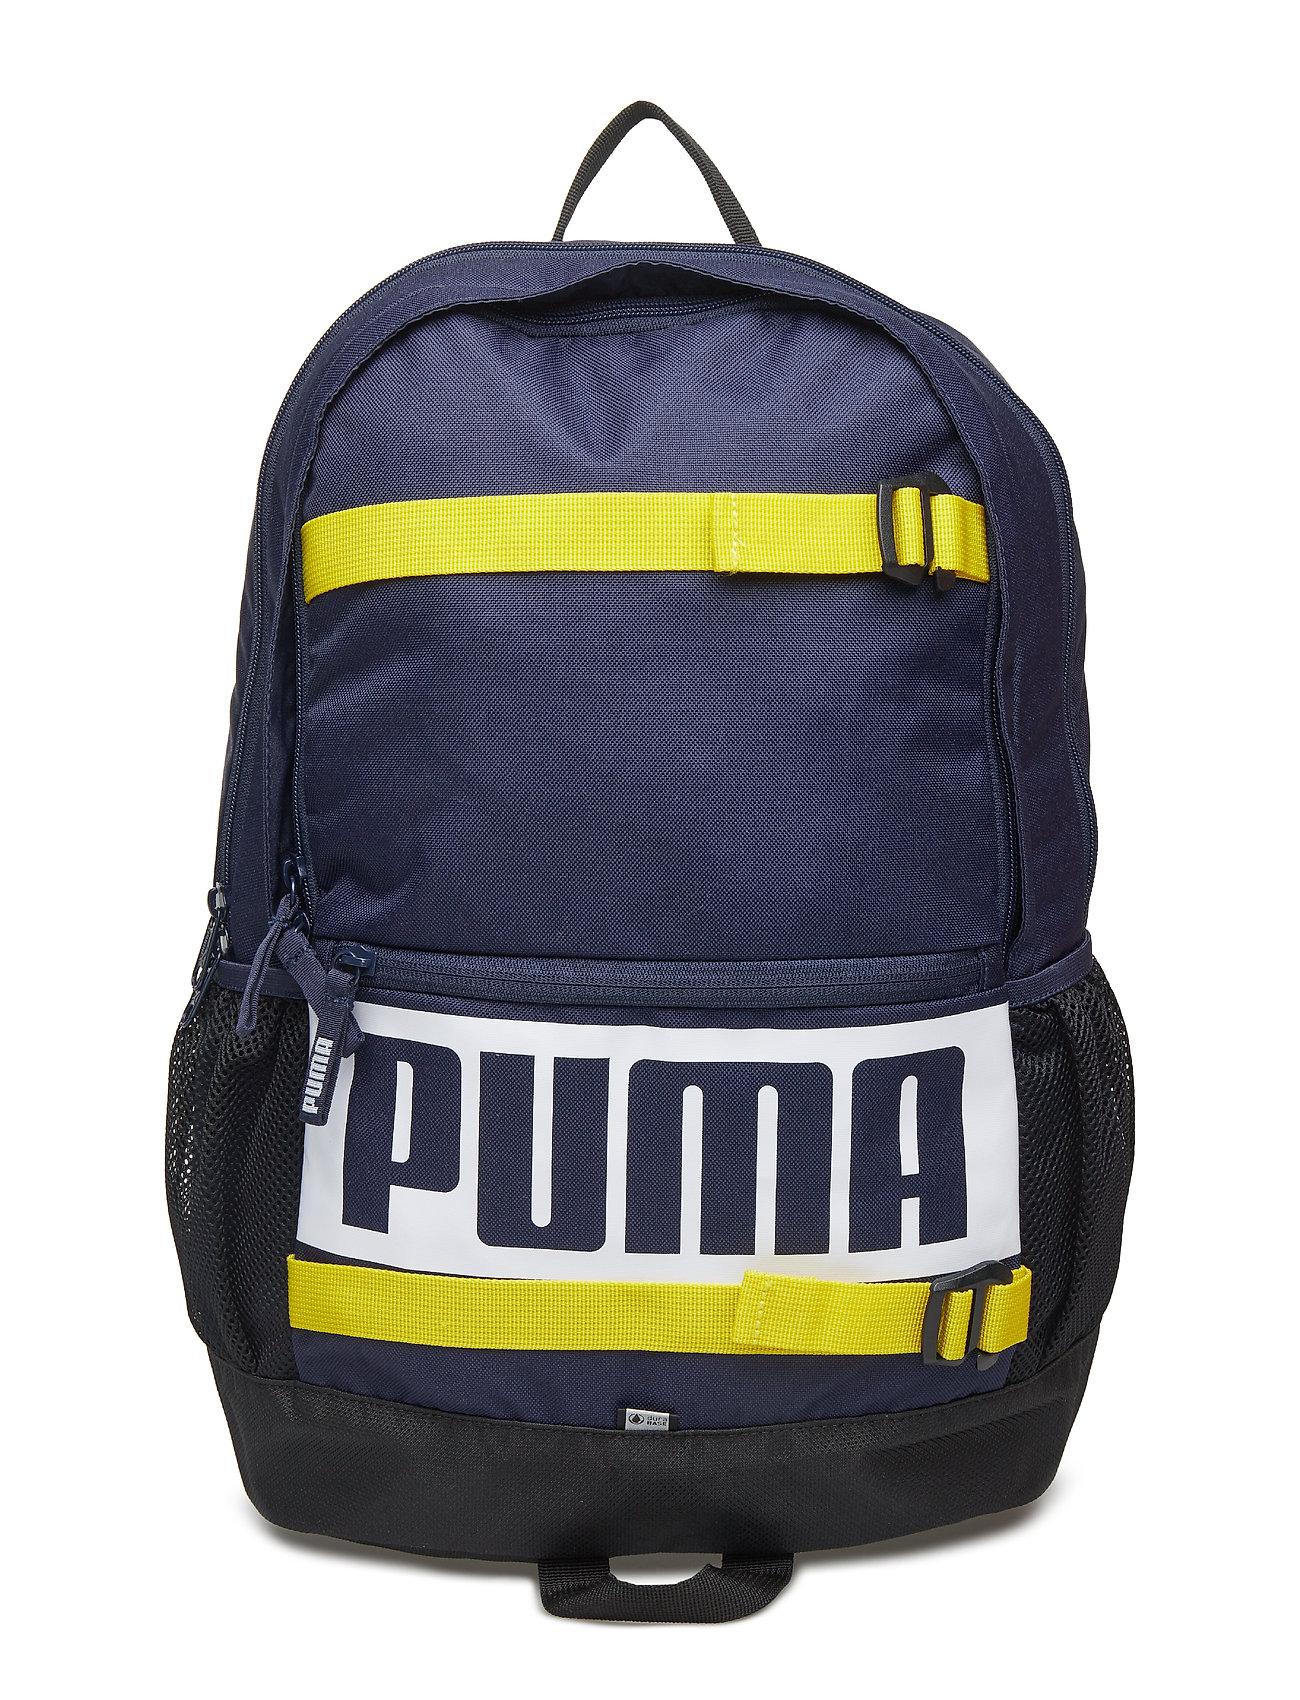 PUMA PUMA Deck Backpack Ryggsäckar